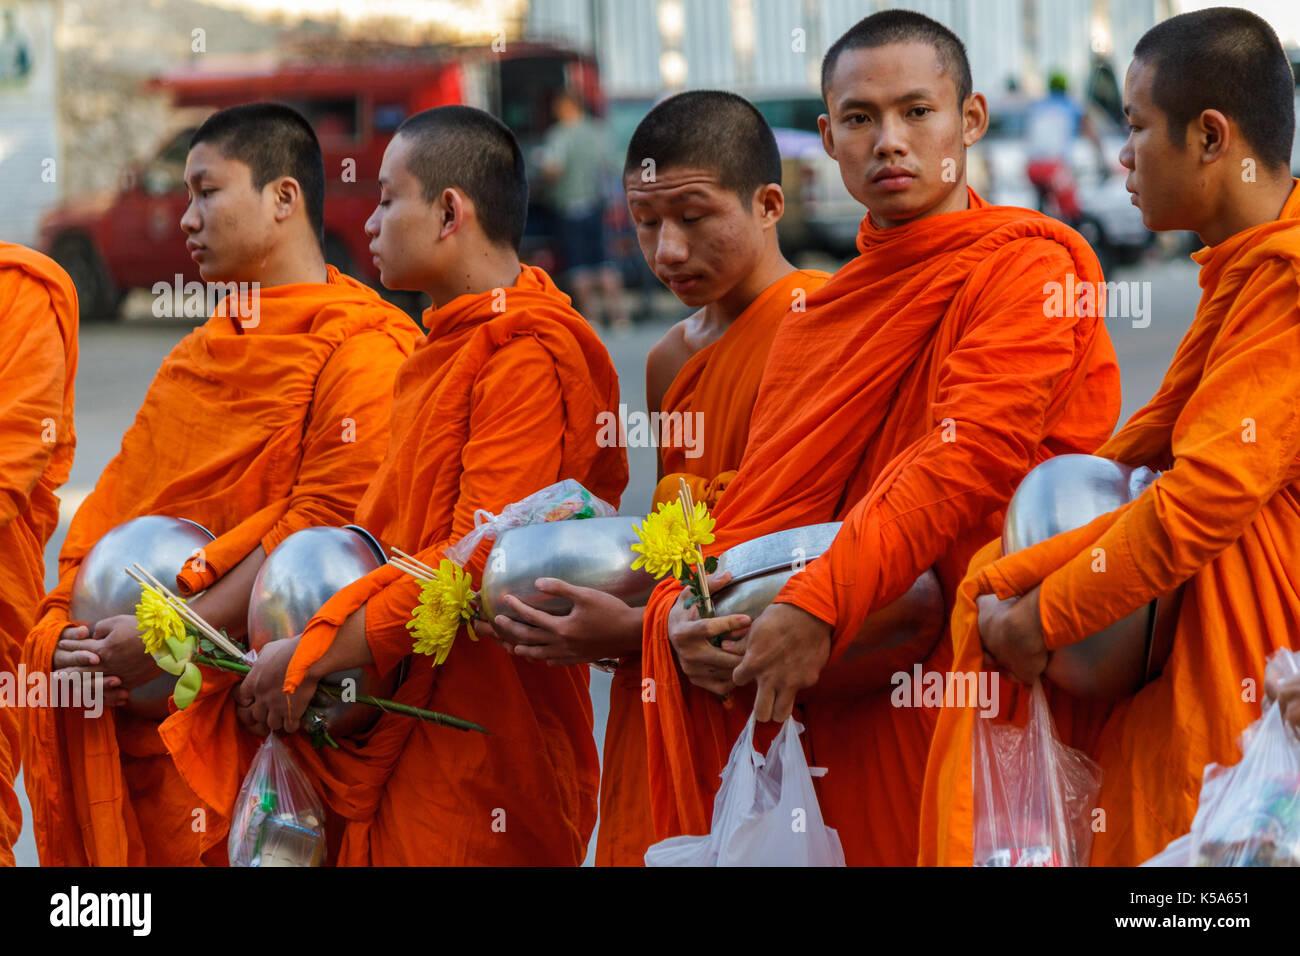 Chiang Mai, Thailandia - 1/8/2016: giovani monaci raccogliere donazioni in Chiang Mai, Thailandia. Immagini Stock